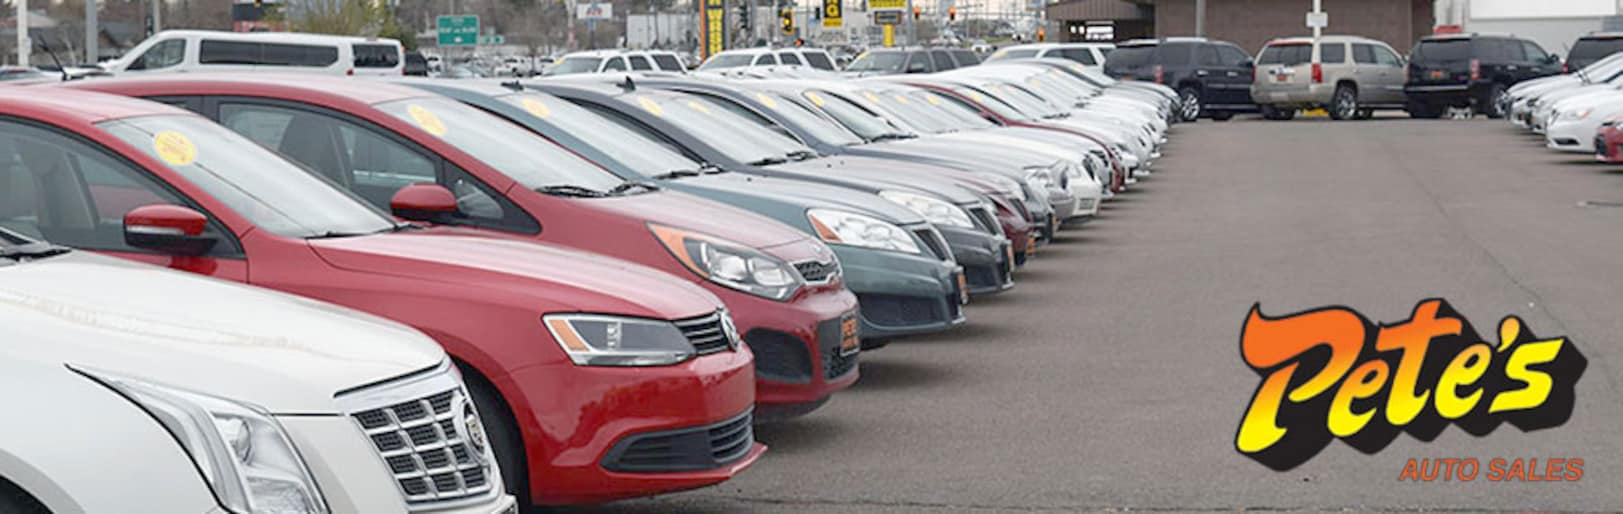 Pete's Auto Sales | Used Cars Great Falls MT | Auto Dealer